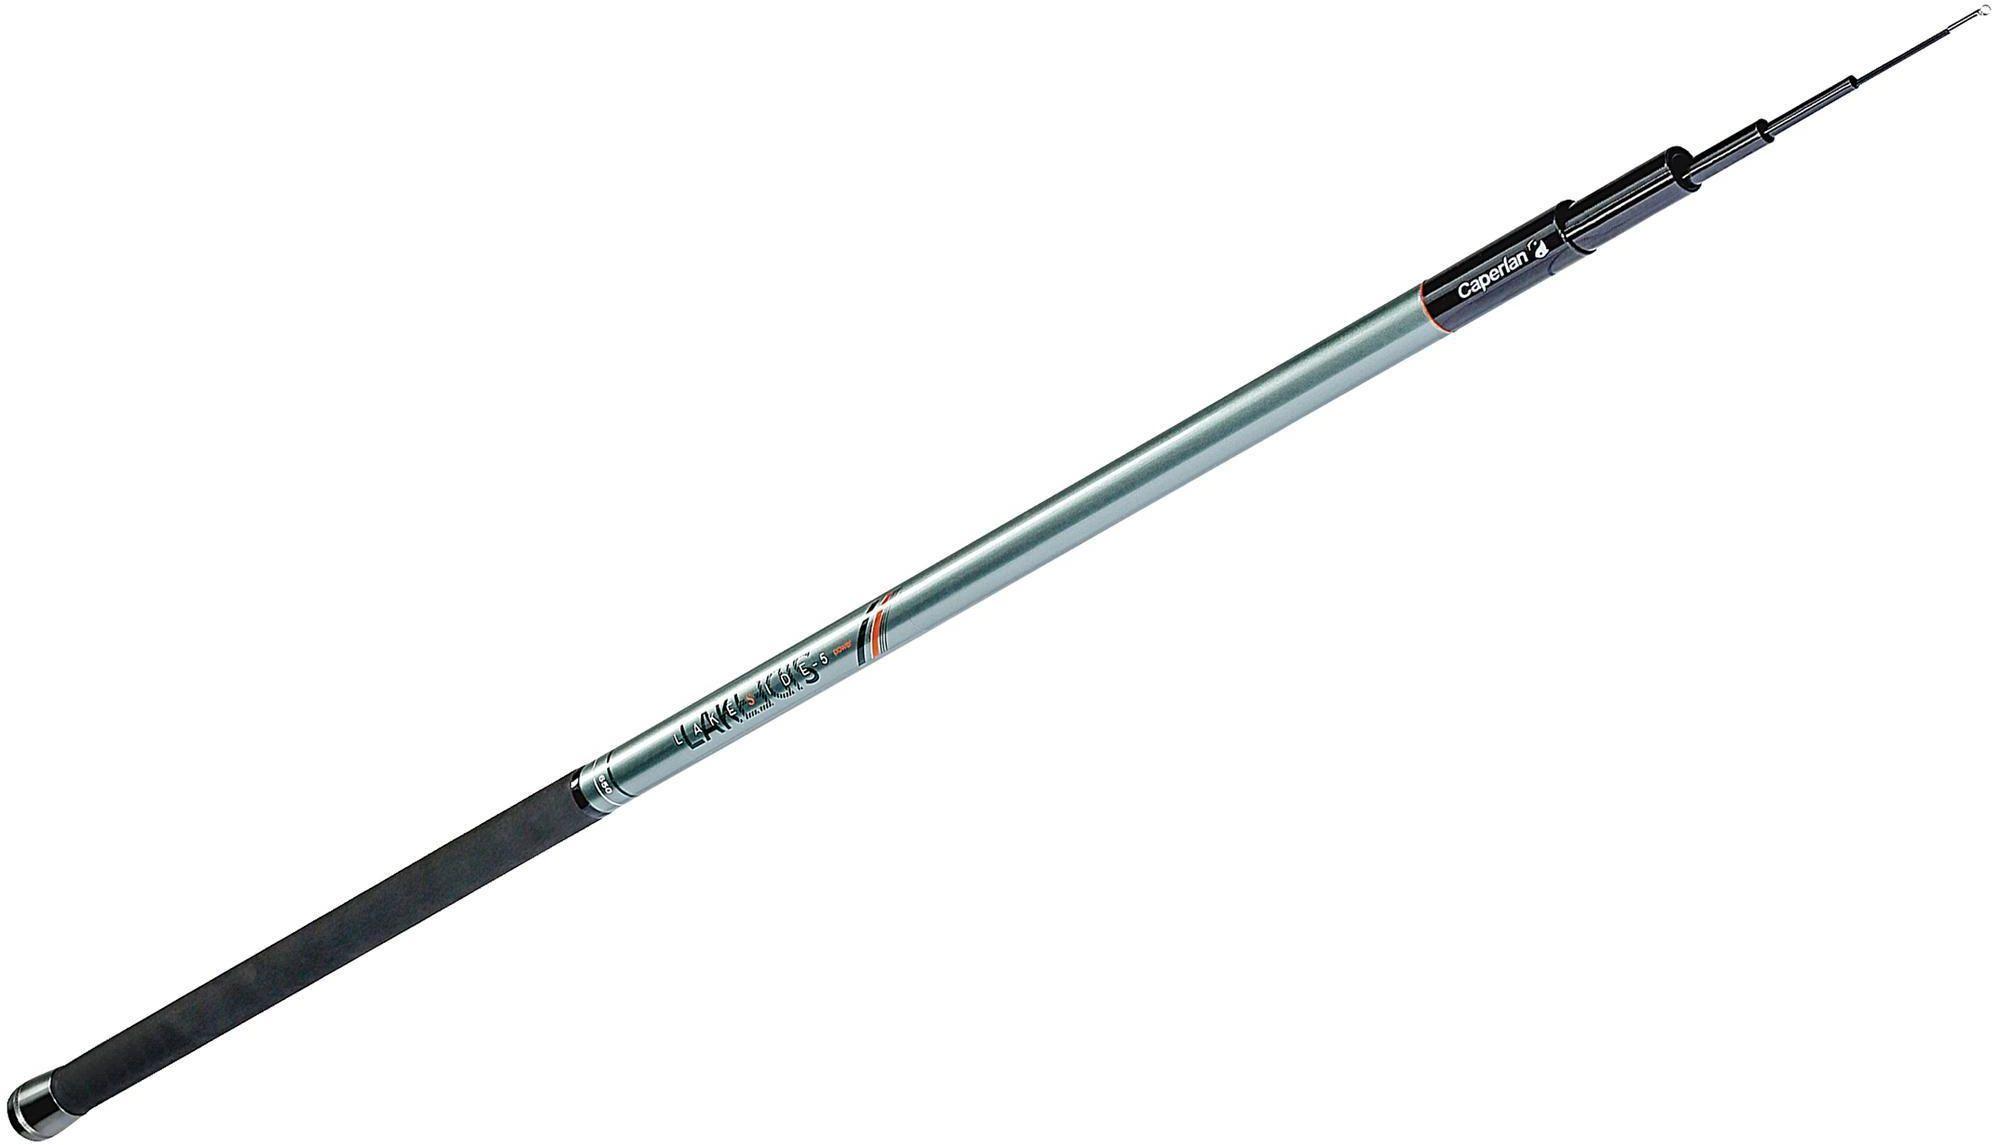 Wędka Lakeside-5 Power 650